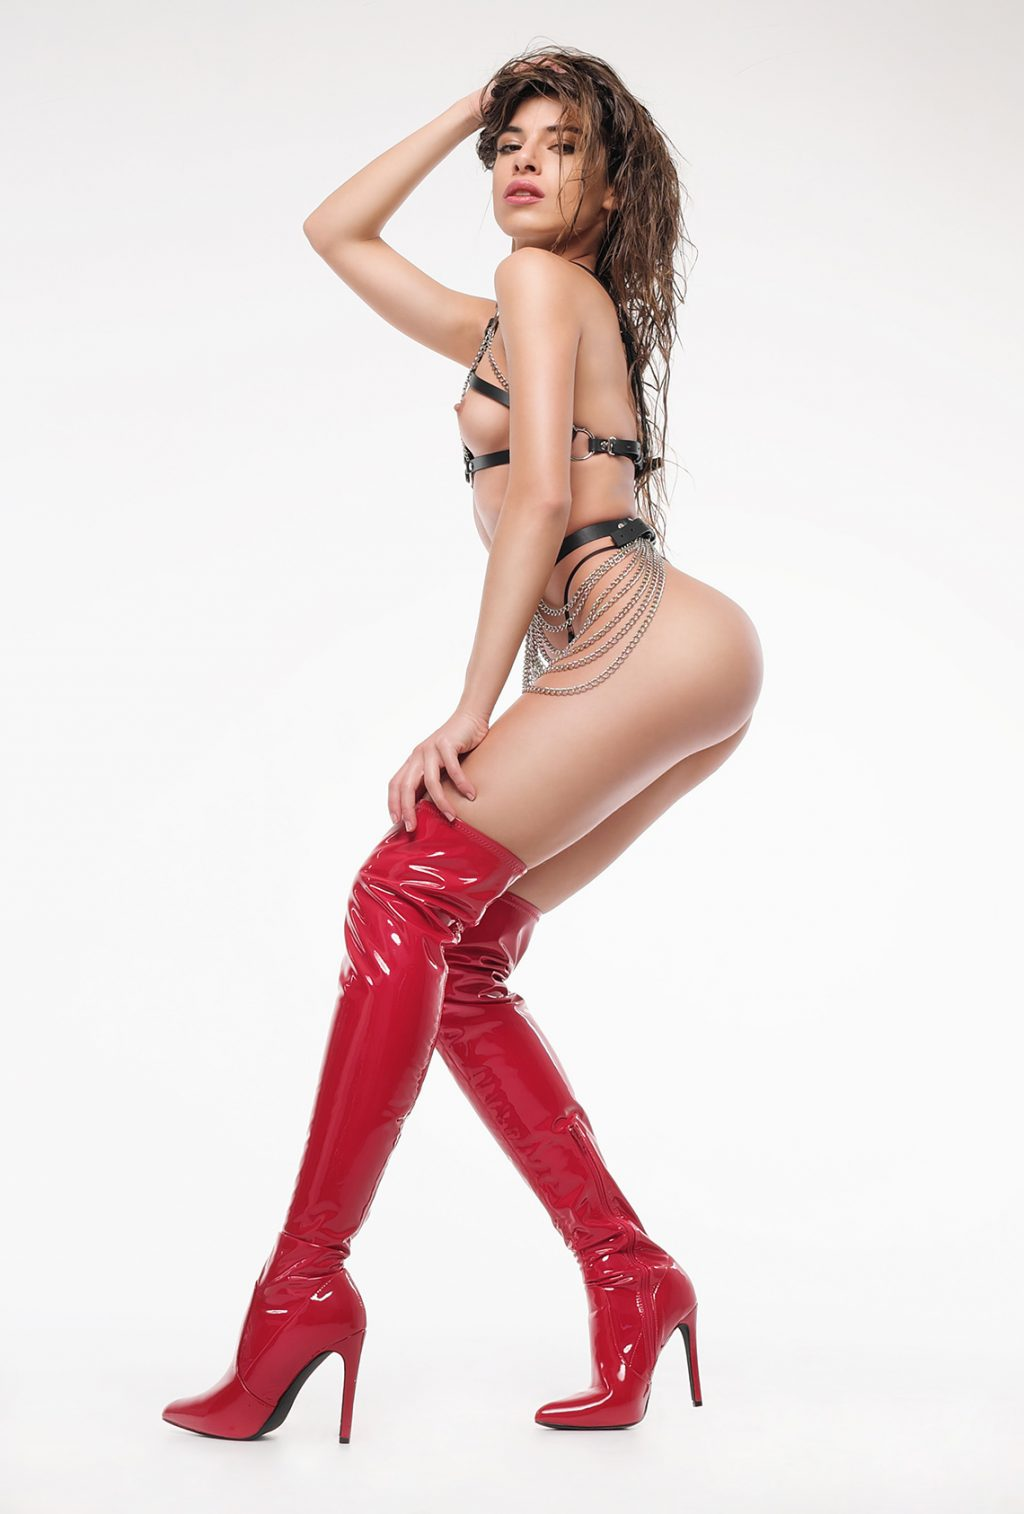 Chiara Bianchino Nude (10 New Photos)